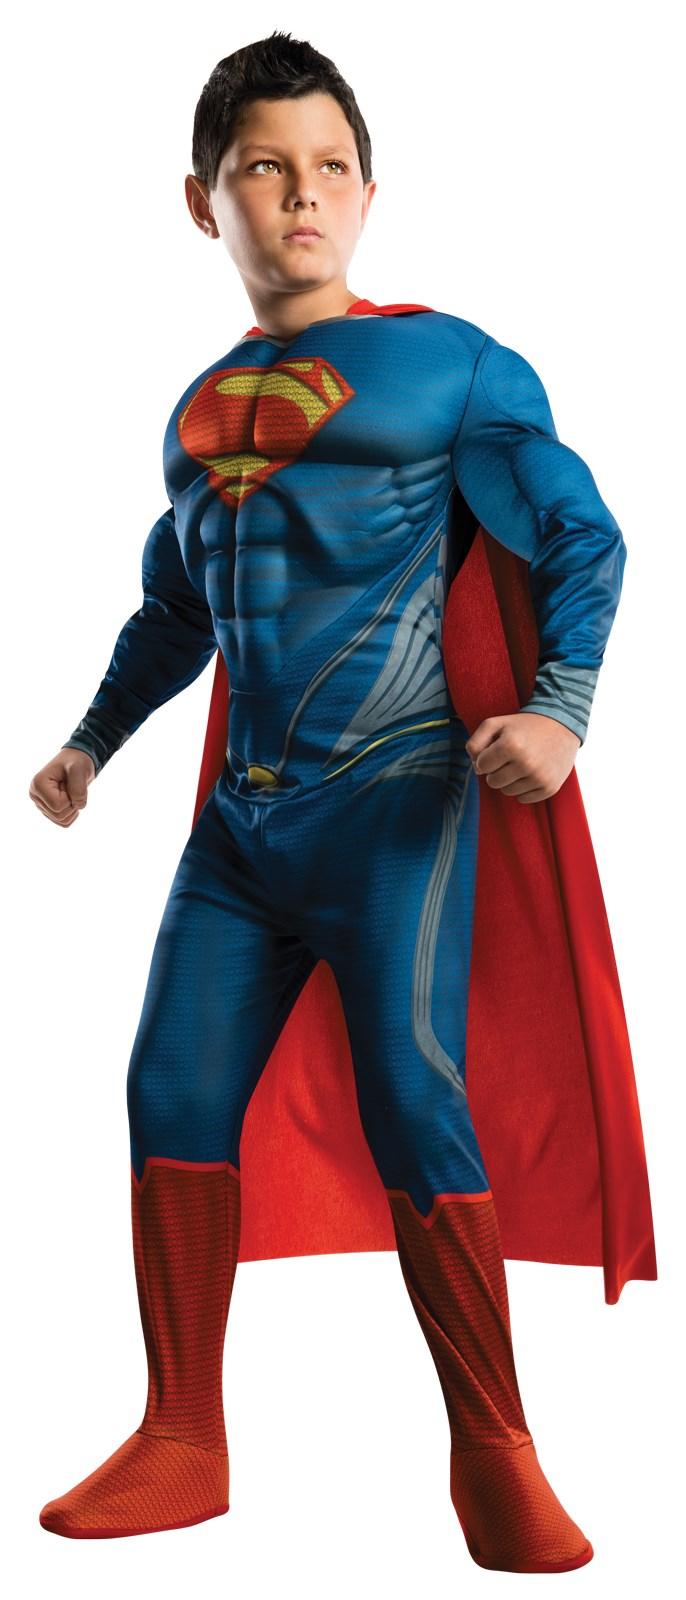 Superman Man of Steel Deluxe Toddler / Child Costume